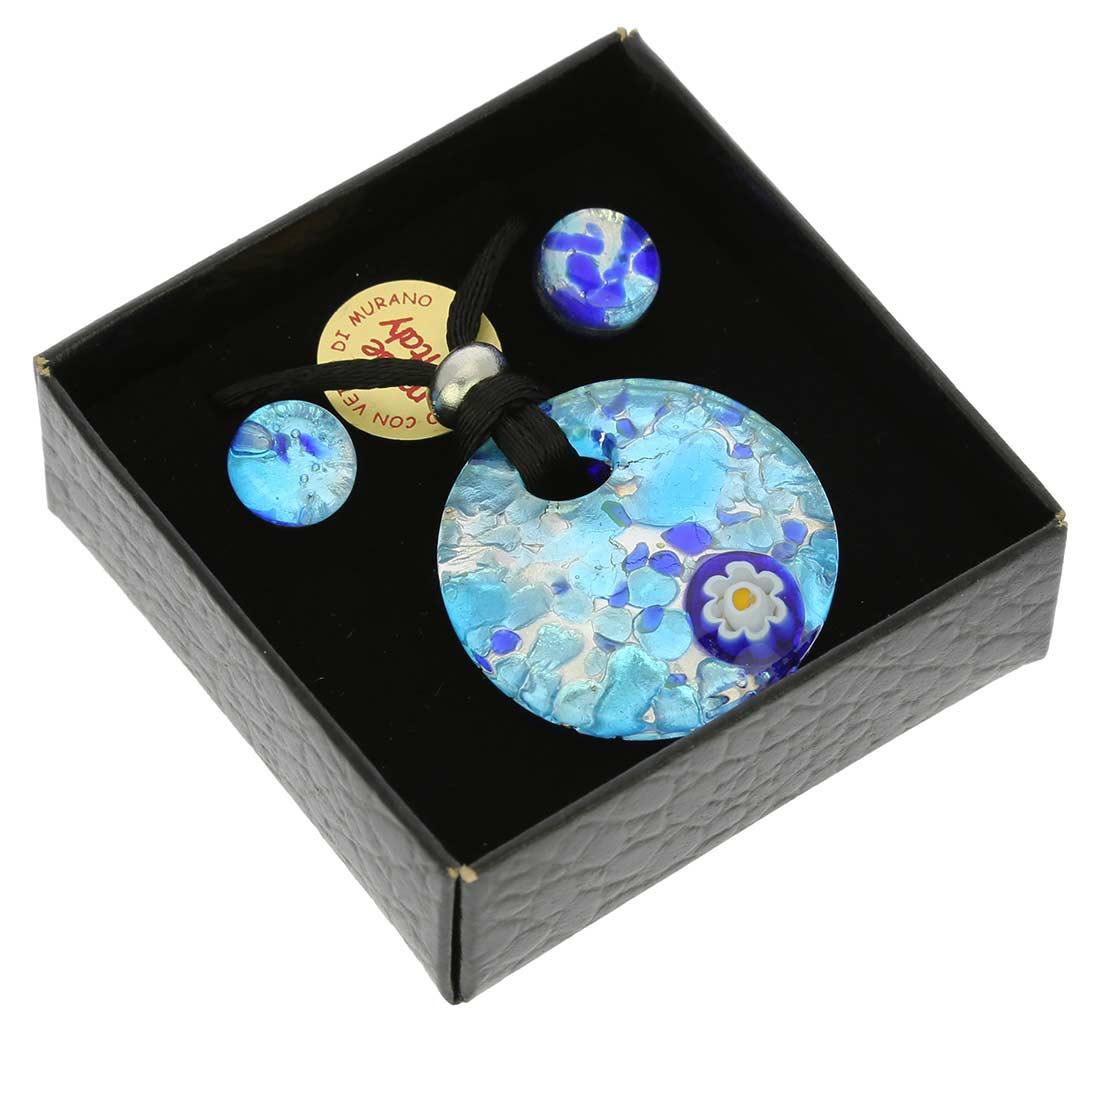 Venetian Reflections Round Jewelry Set - Aqua Blue